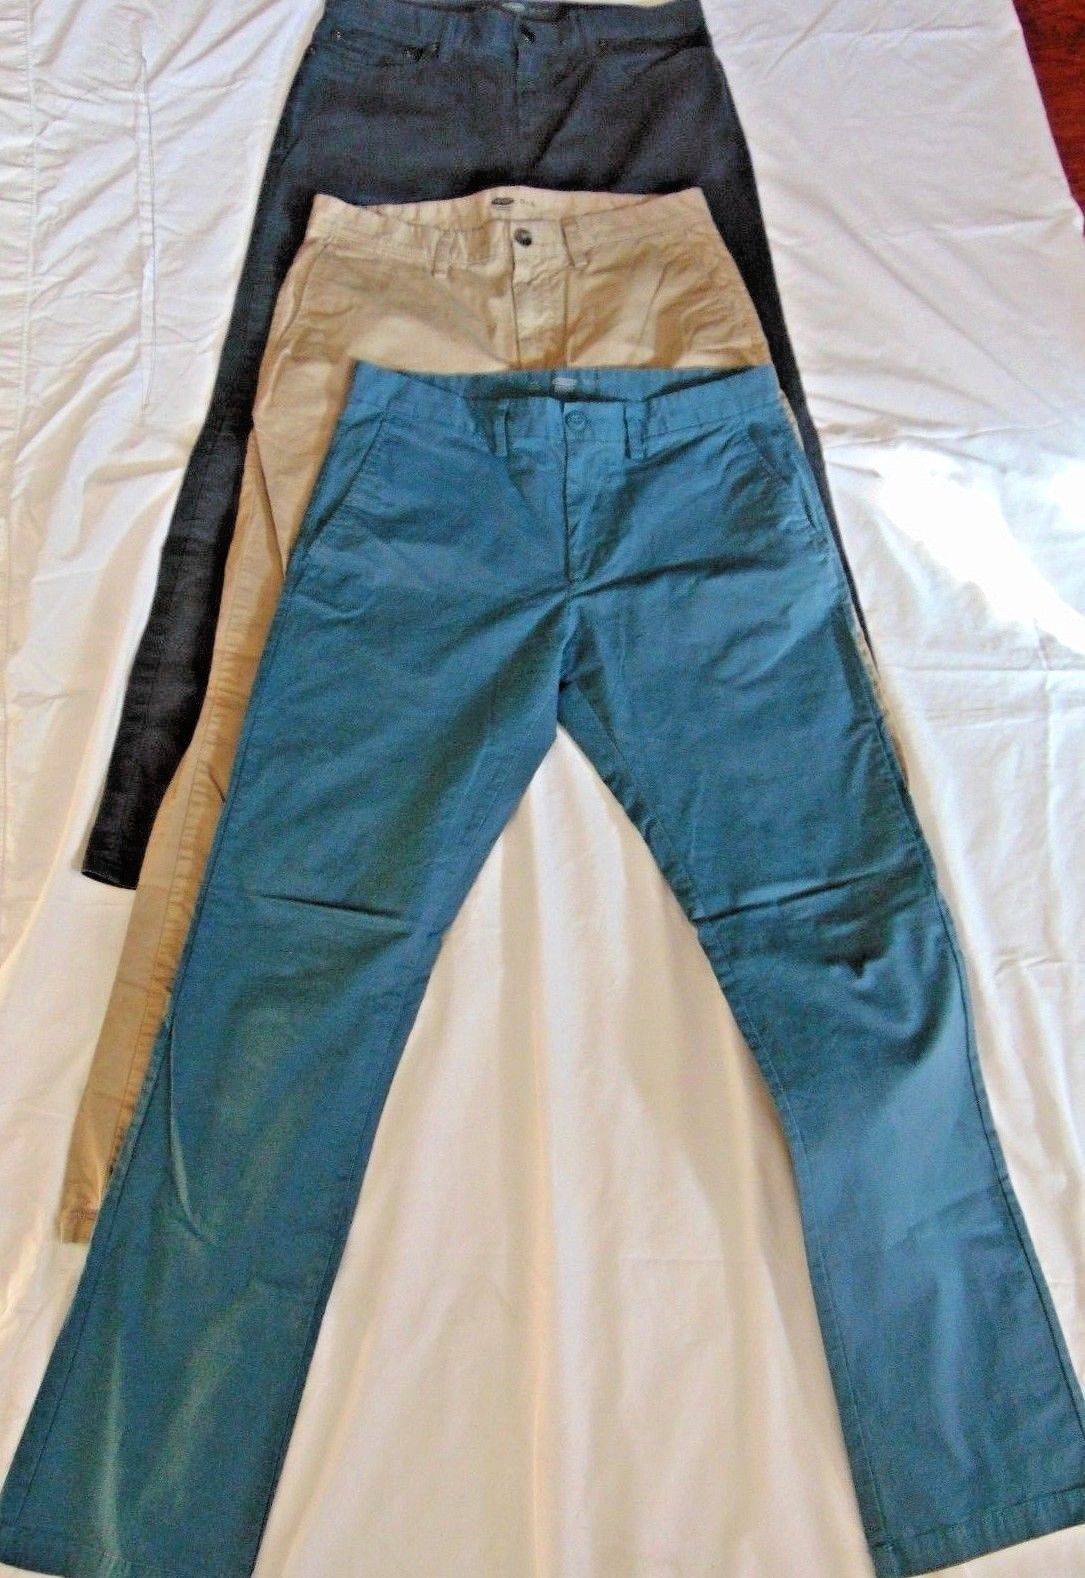 793d31af228 Old Navy 3 Assorted Men s Khaki Dress Pants and 50 similar items. 57